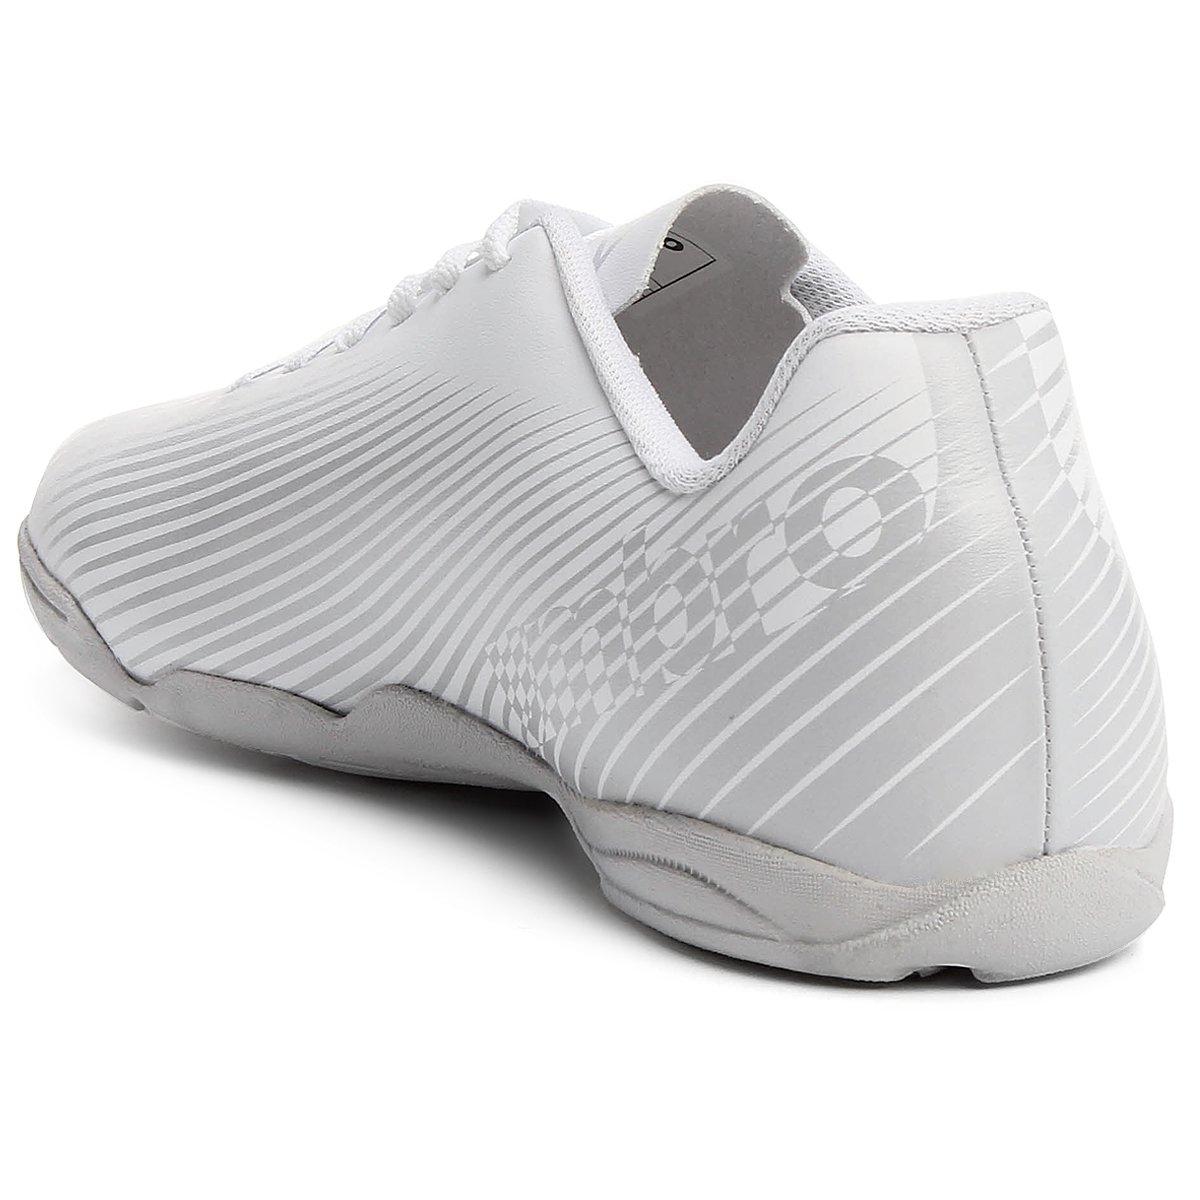 Chuteira Umbro Speed II Futsal - Branco - Compre Agora  eef453350bf5b